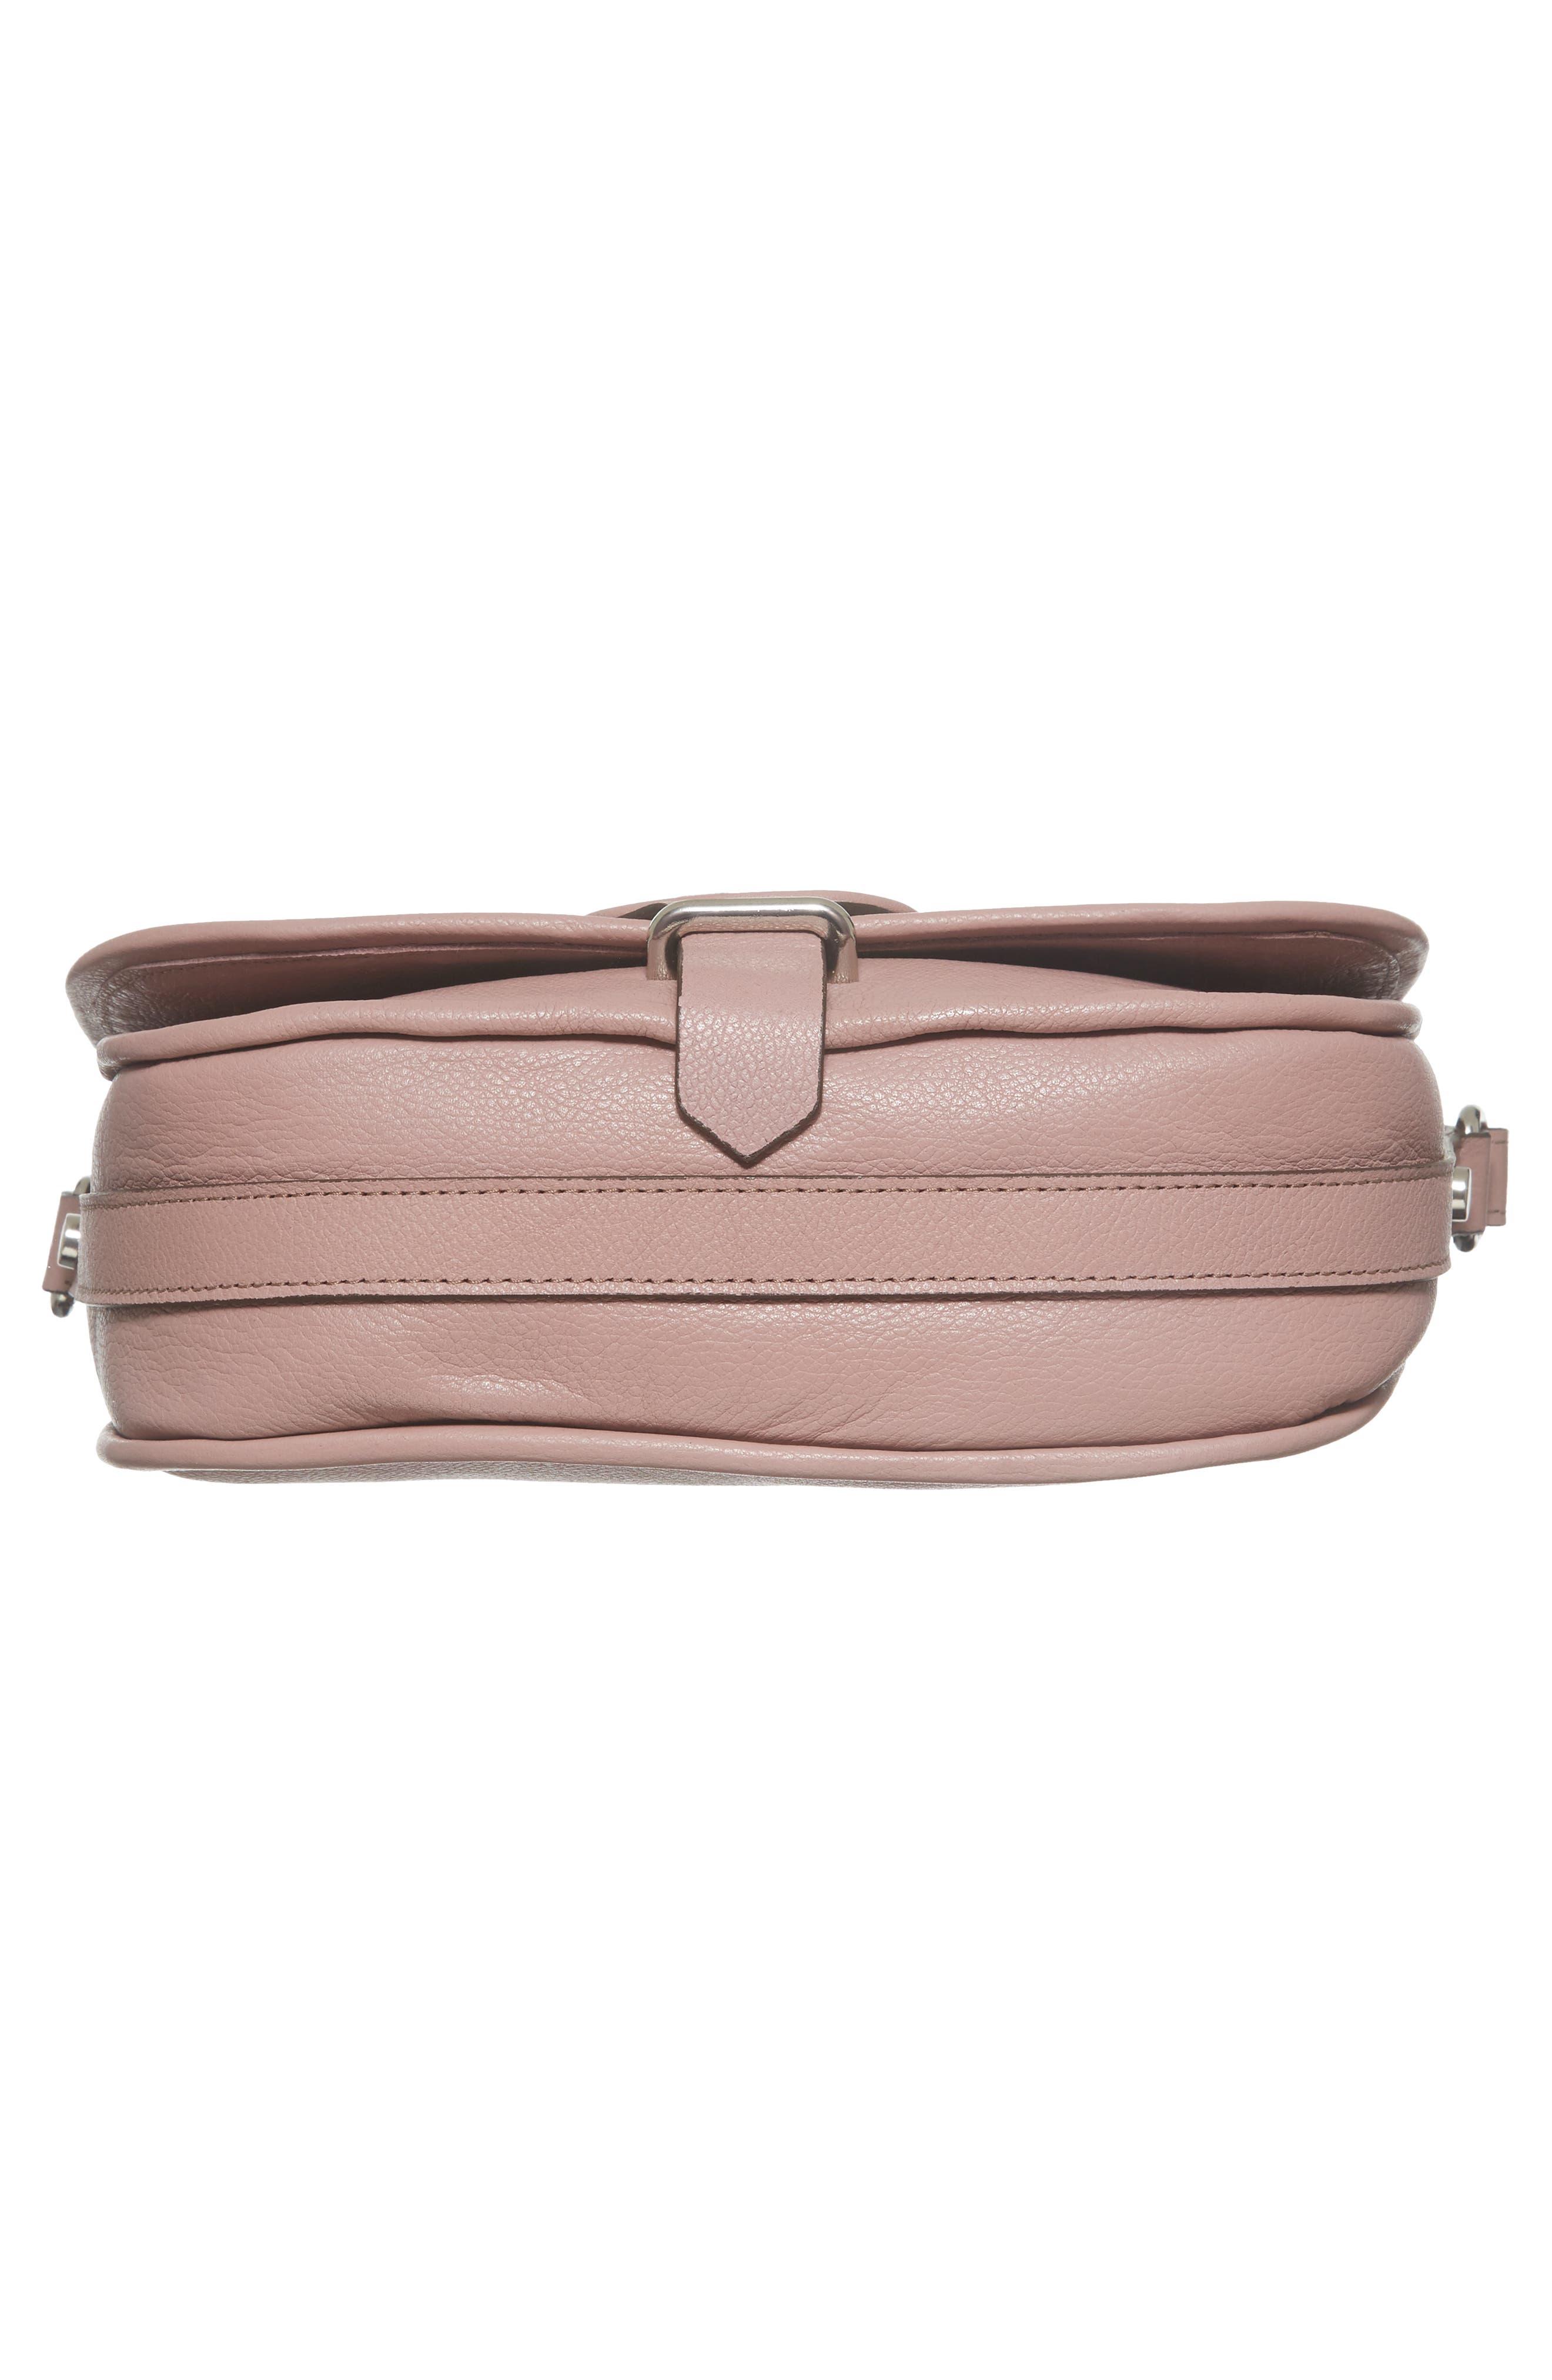 Premium Leather Studded Shoulder Bag,                             Alternate thumbnail 6, color,                             Blush